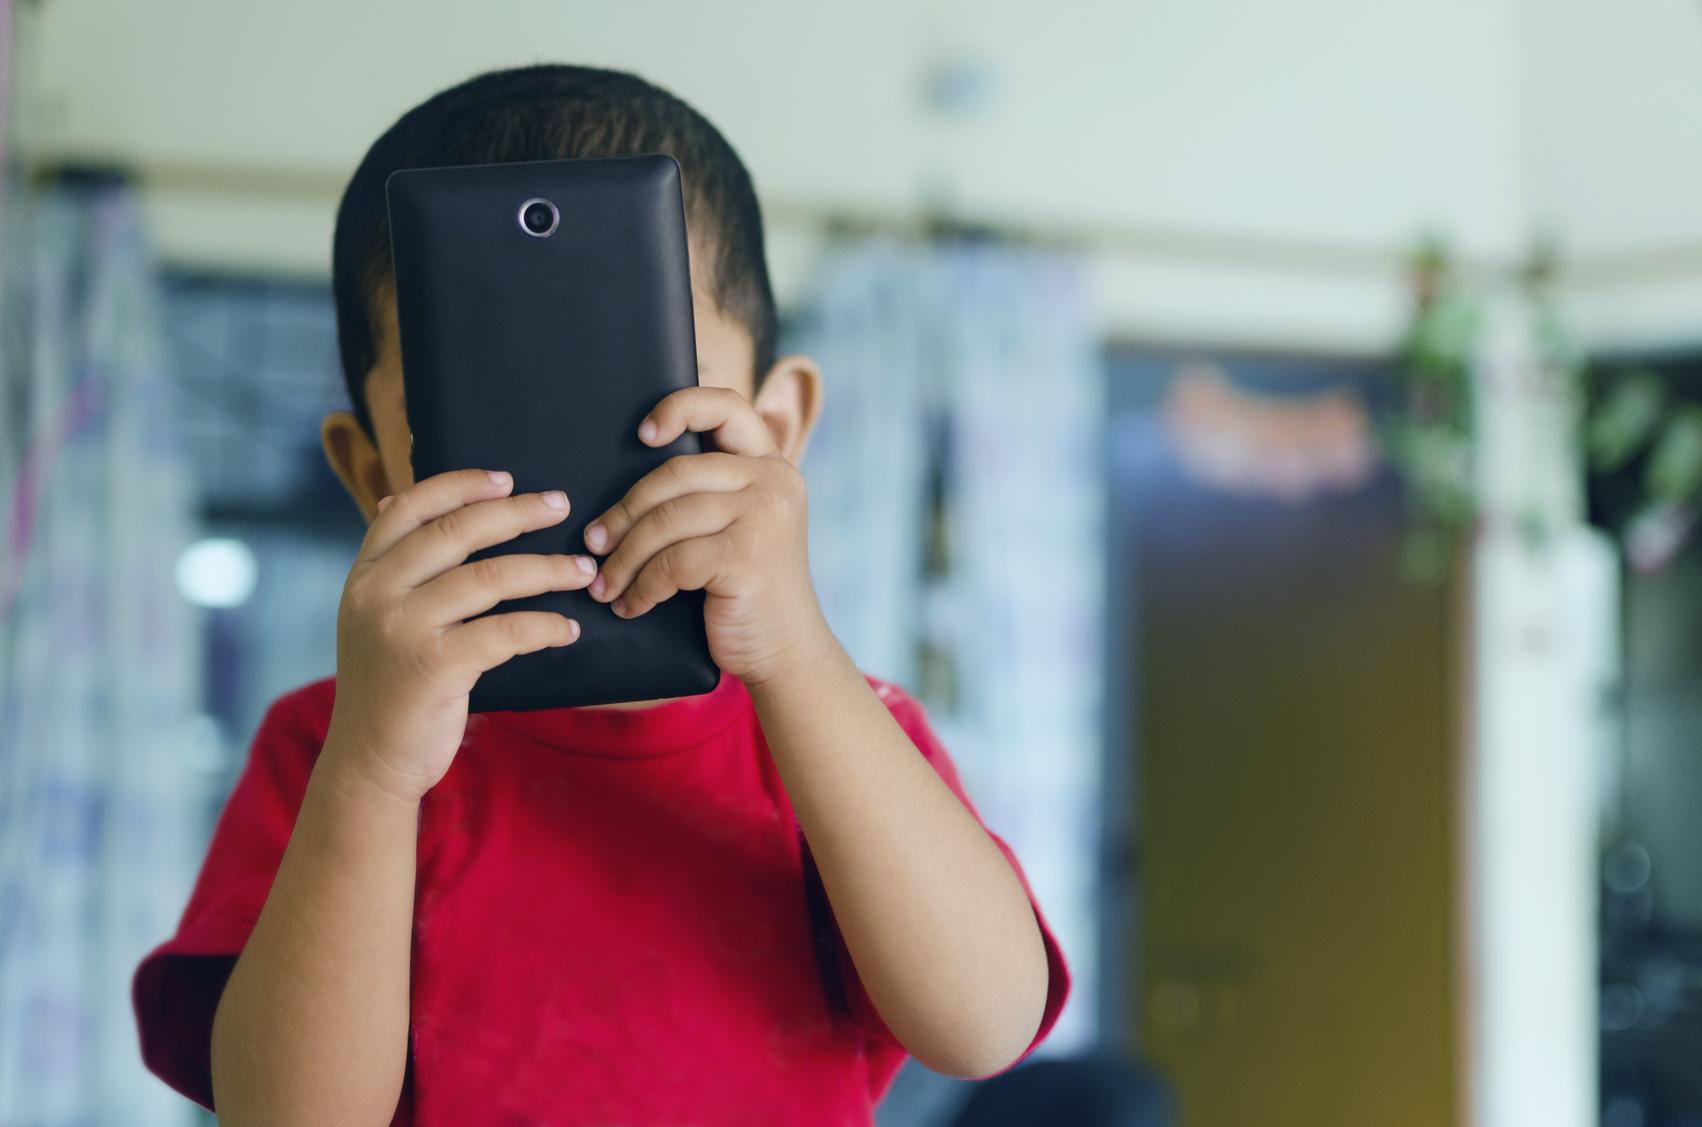 brecha digital enseñar tecnologia